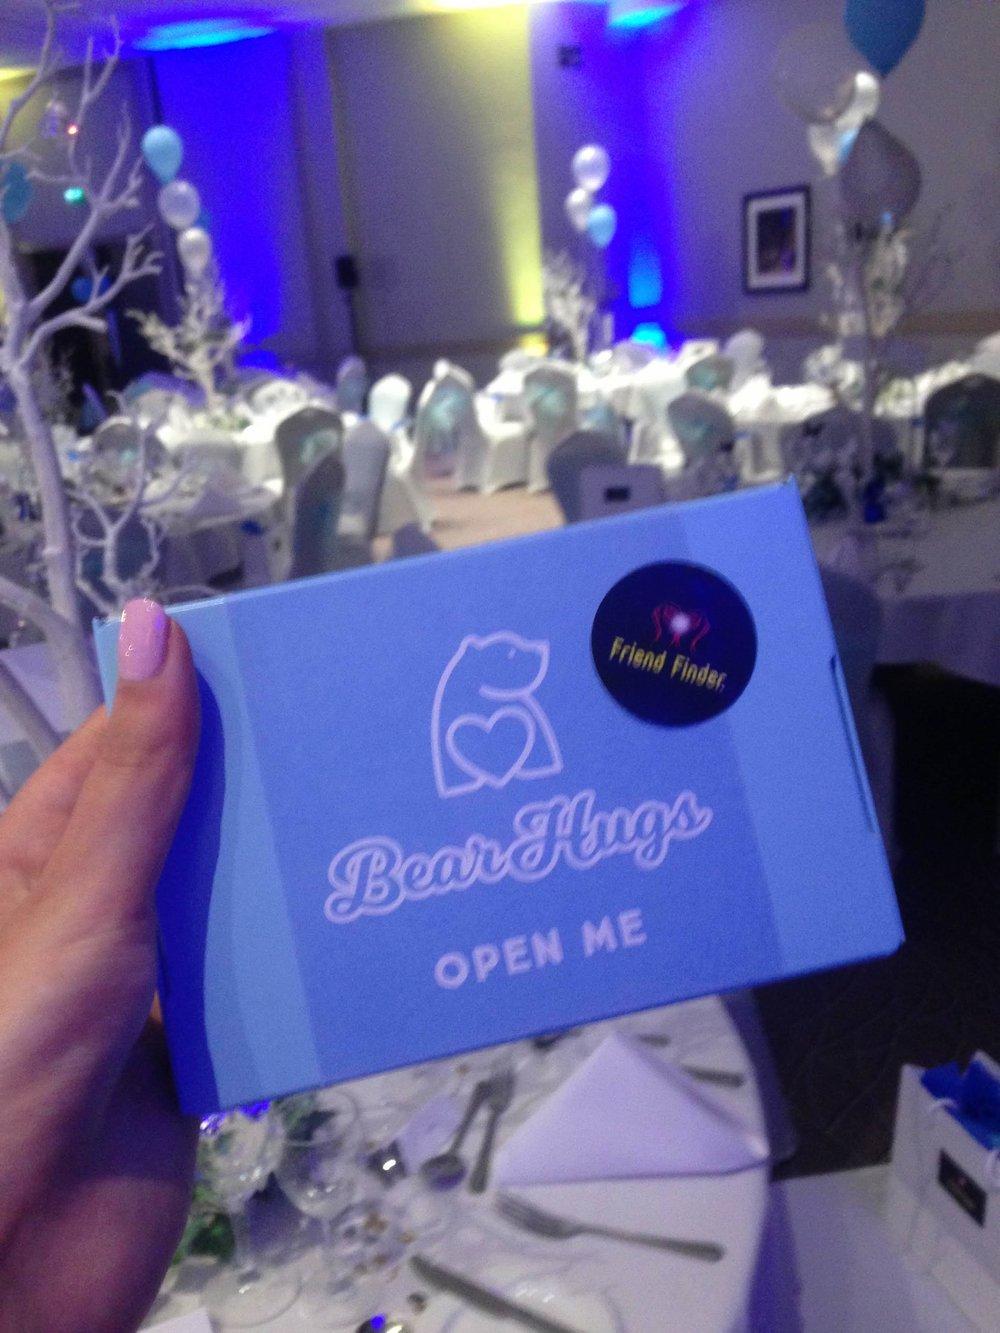 bearhugs friend finder prom 1:50 hug in a box donation scheme